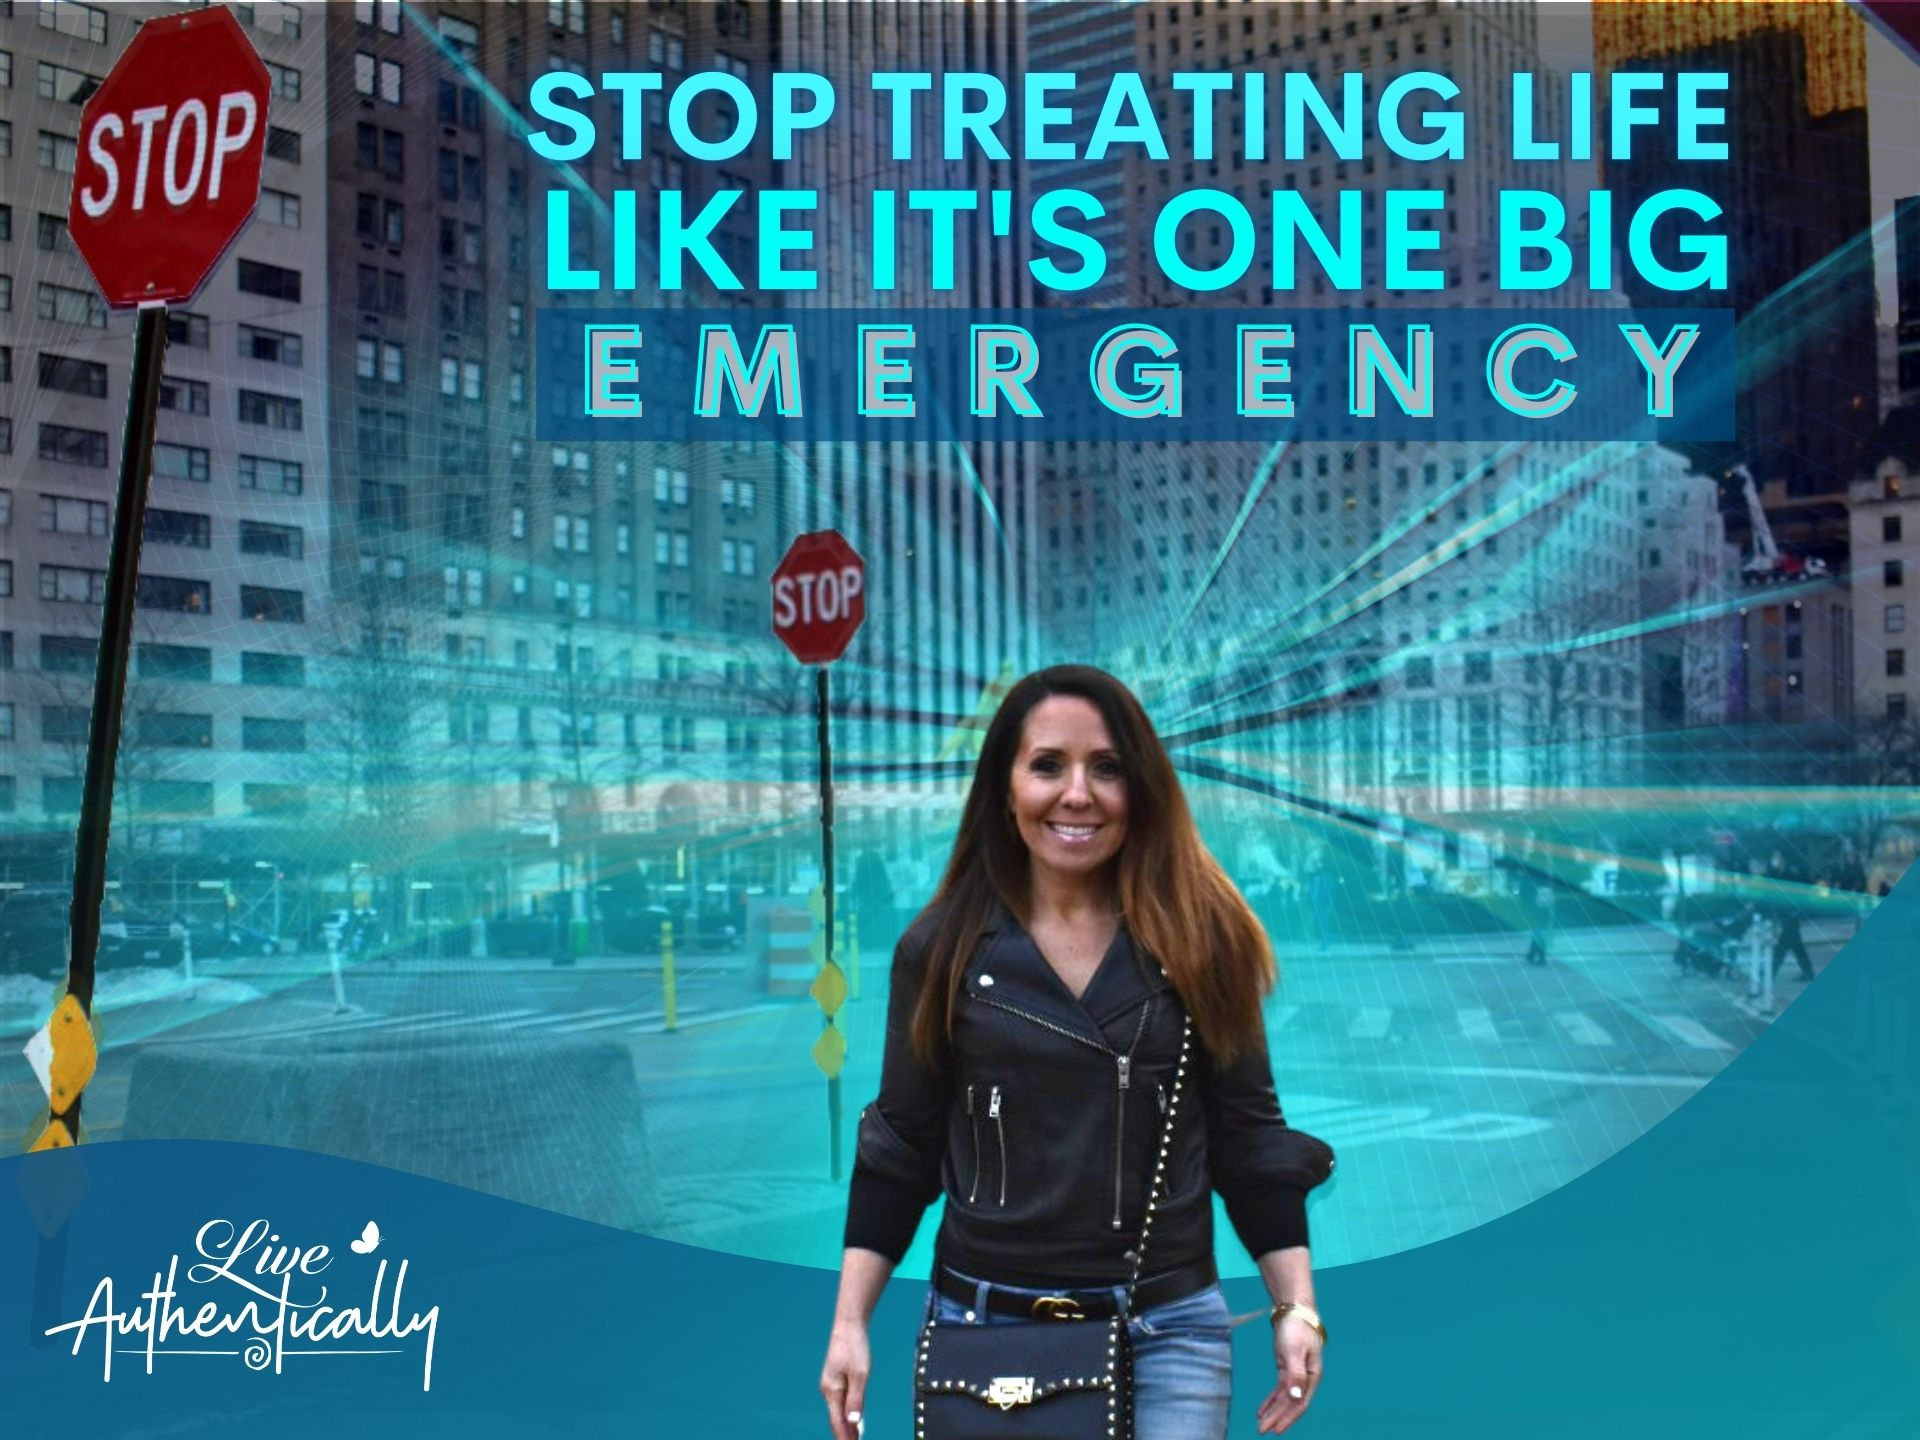 Stop Treating Life Like it's One Big Emergency